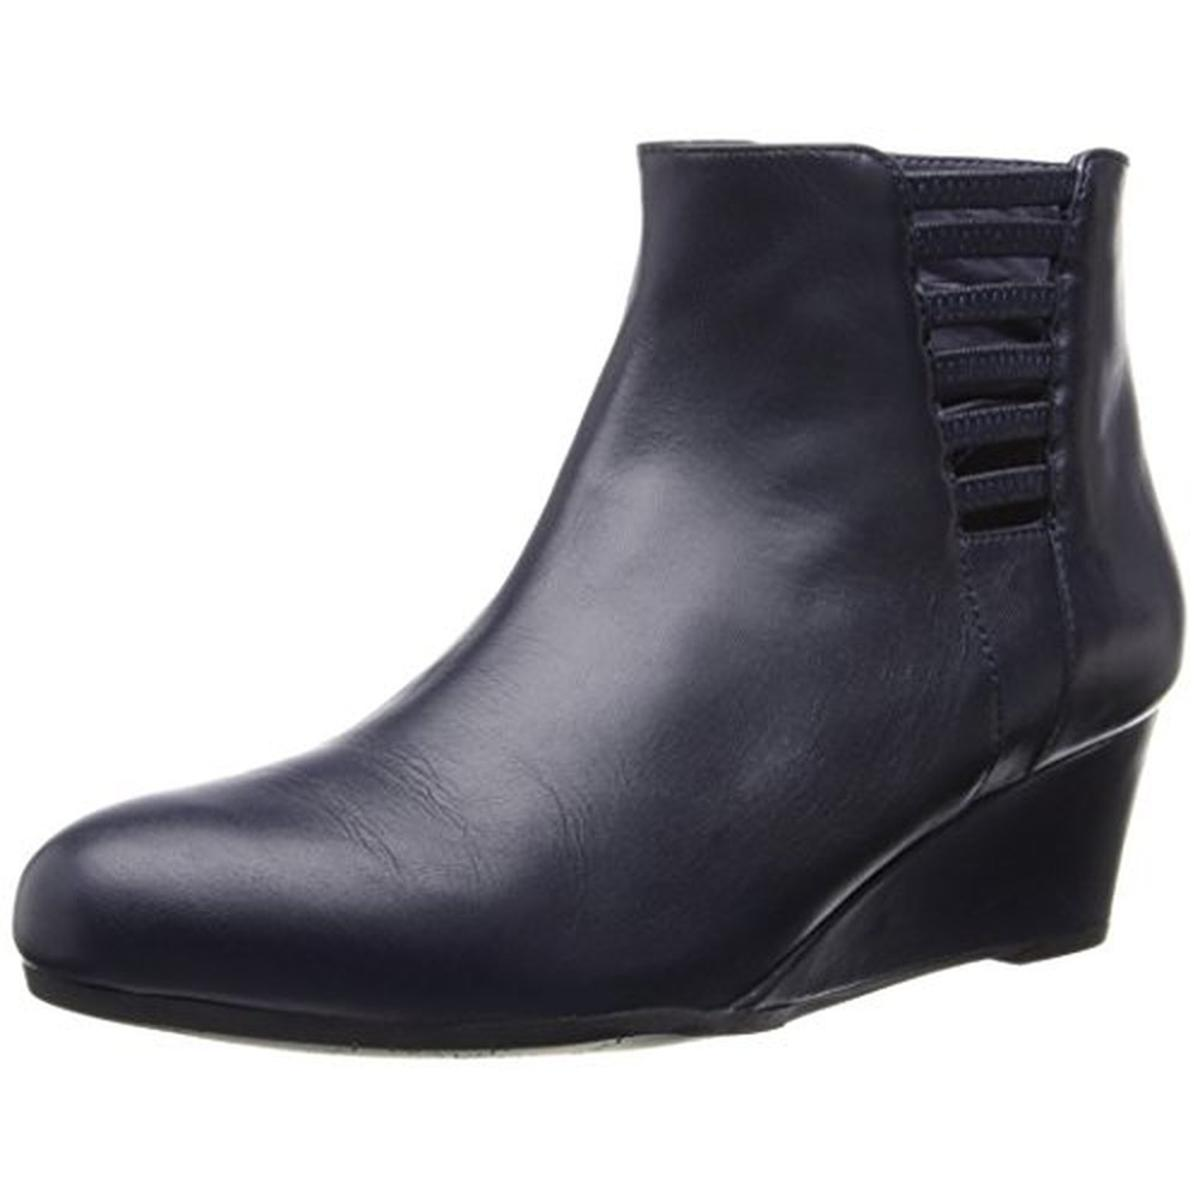 4fa30f379138 VANELi Womens Laban Leather Wedge Booties - Walmart.com